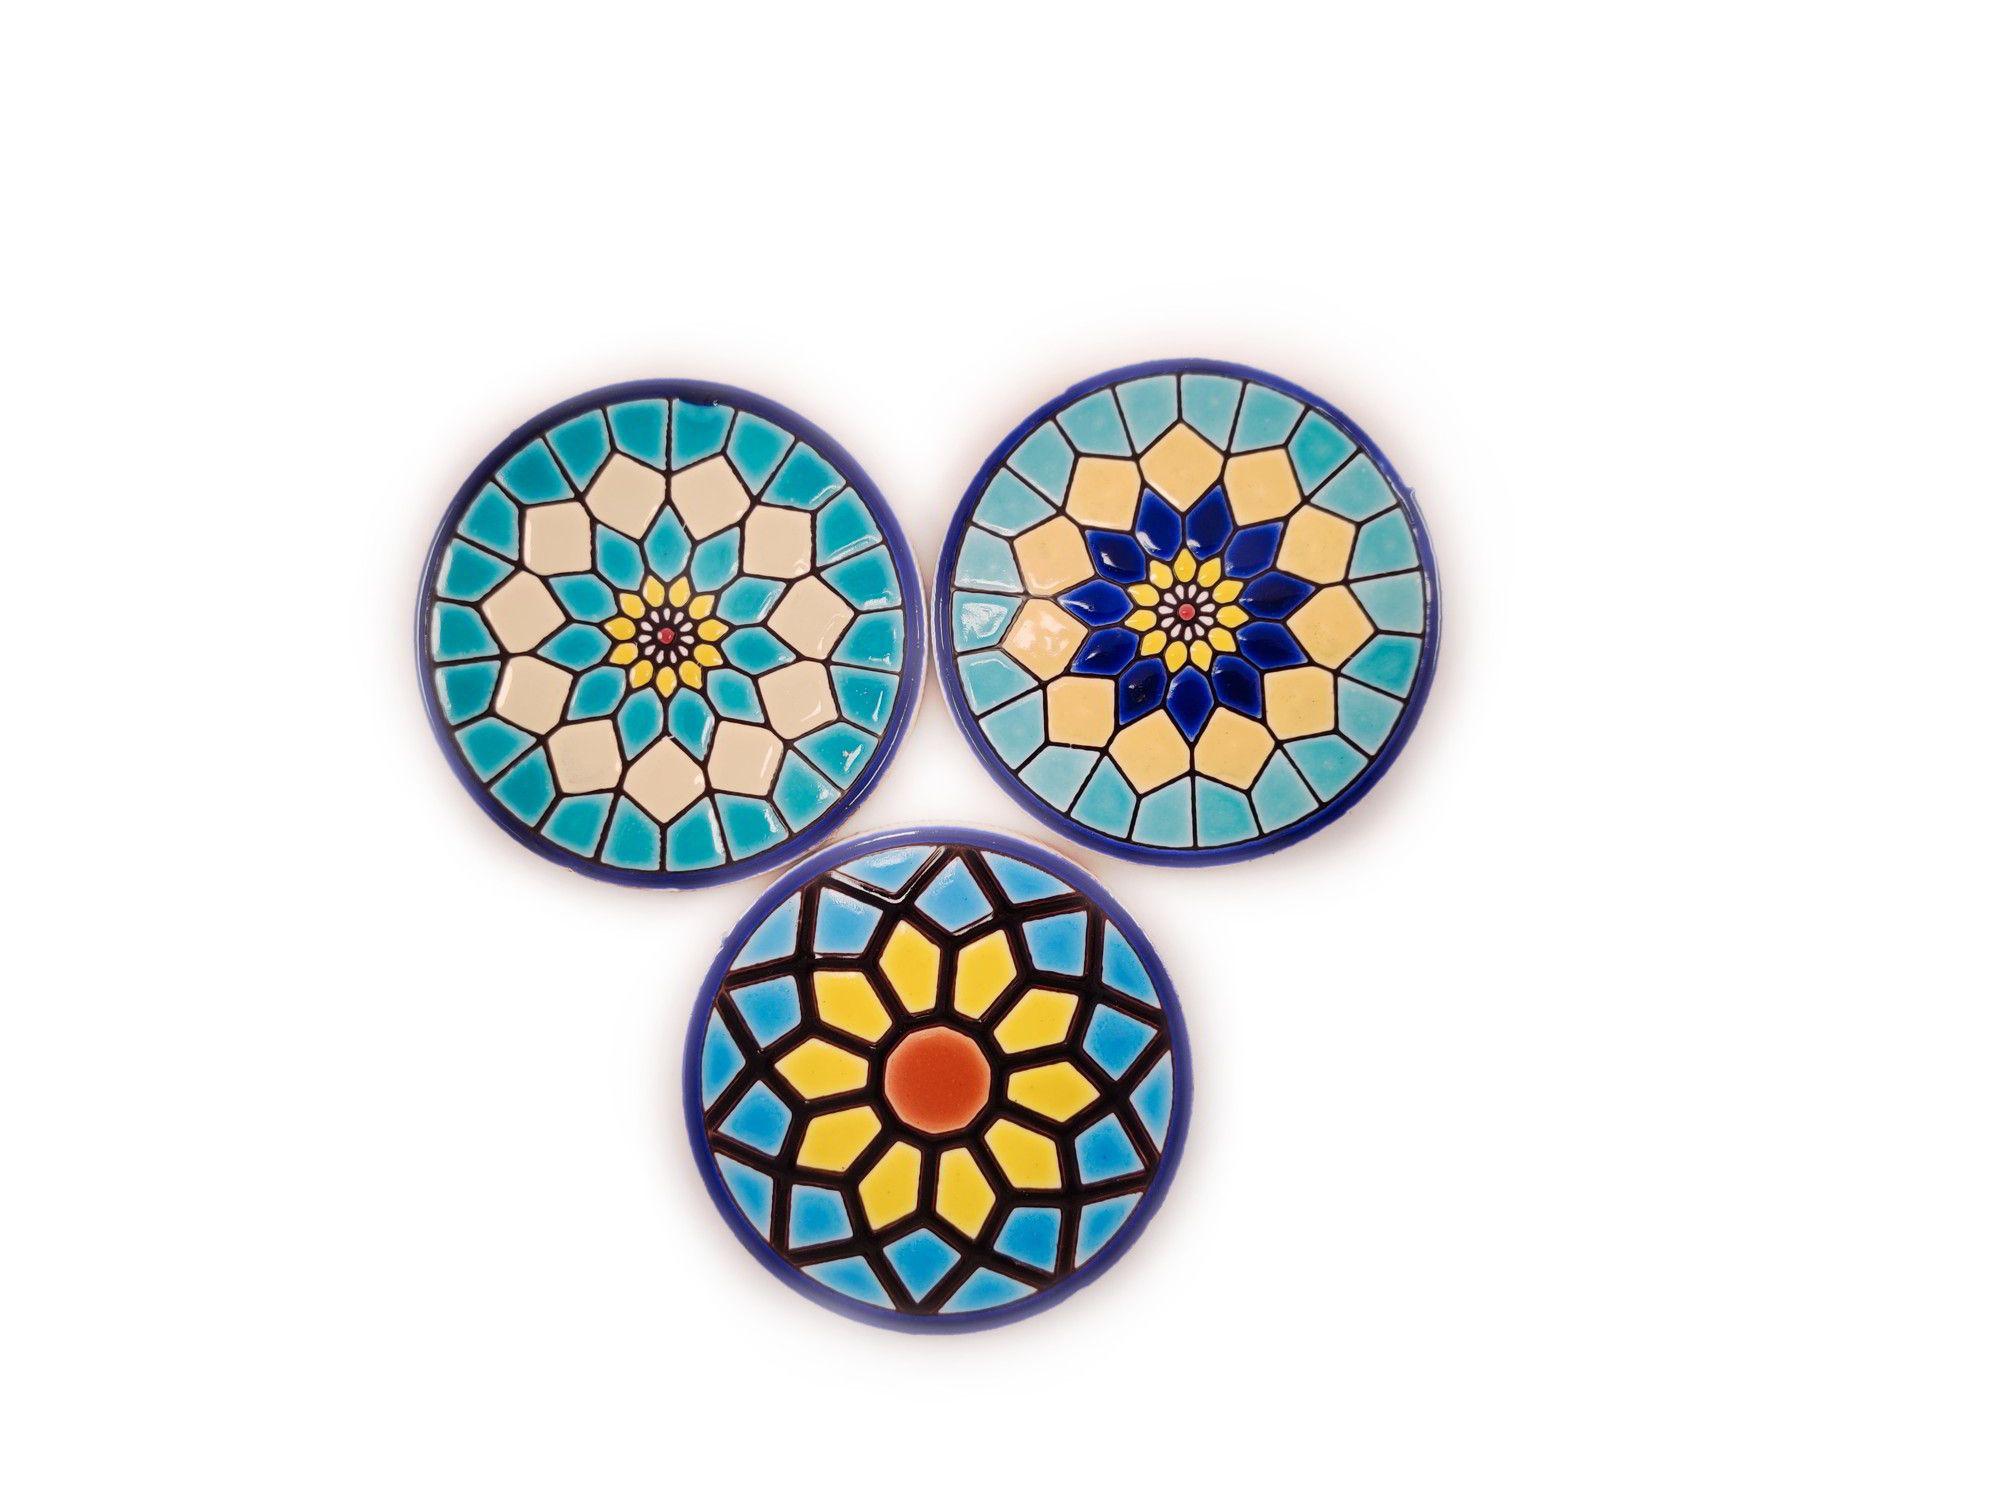 Ceramic tiles category